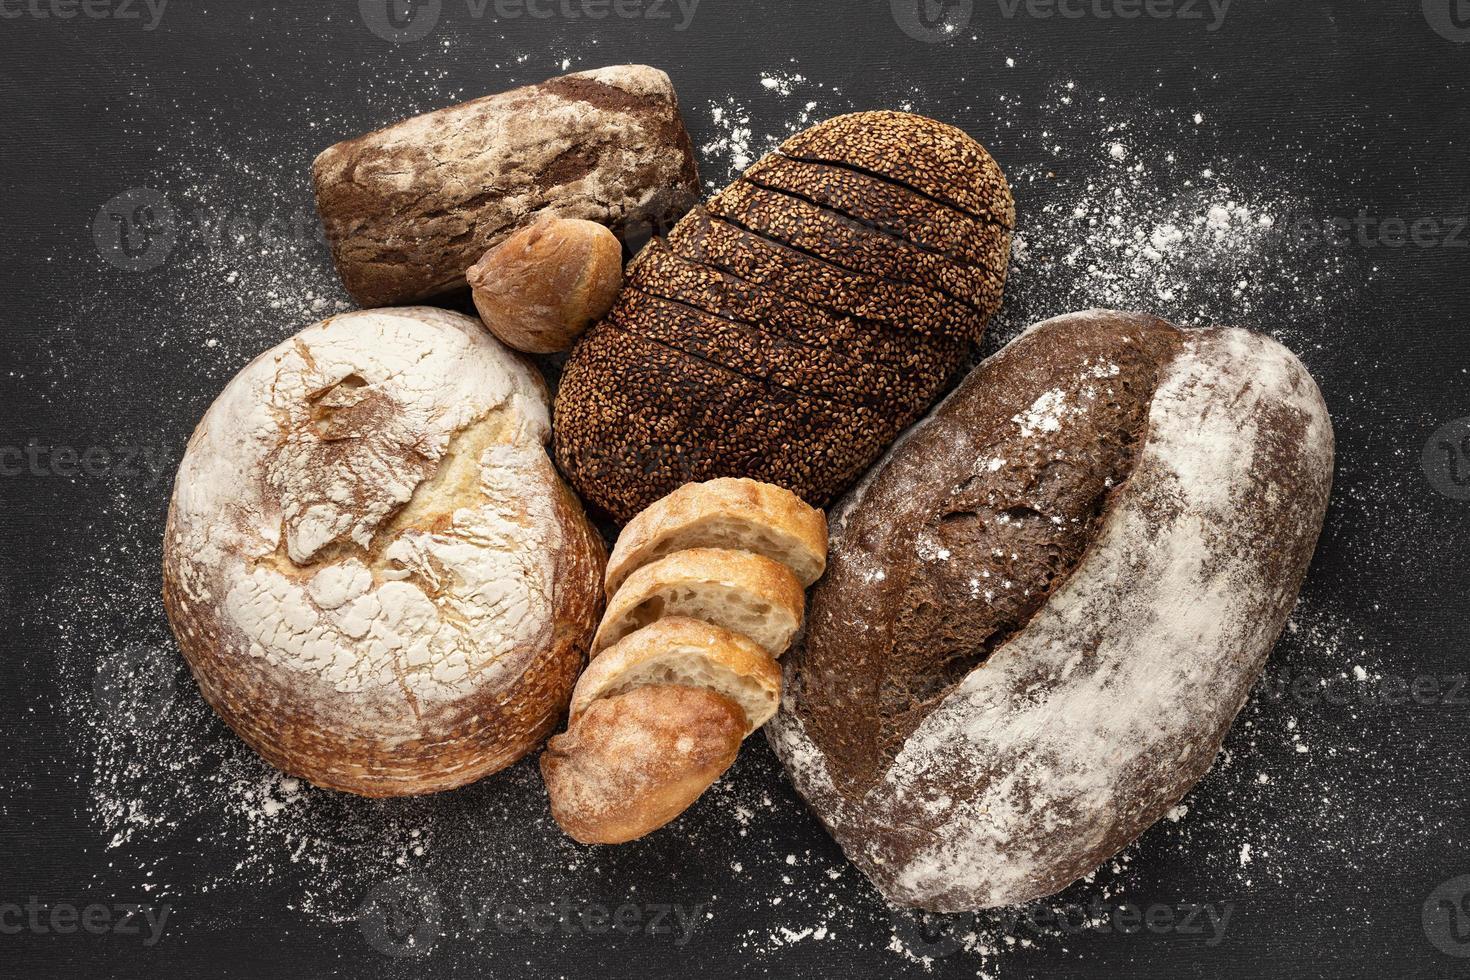 platt låg läckra bröd koncept foto